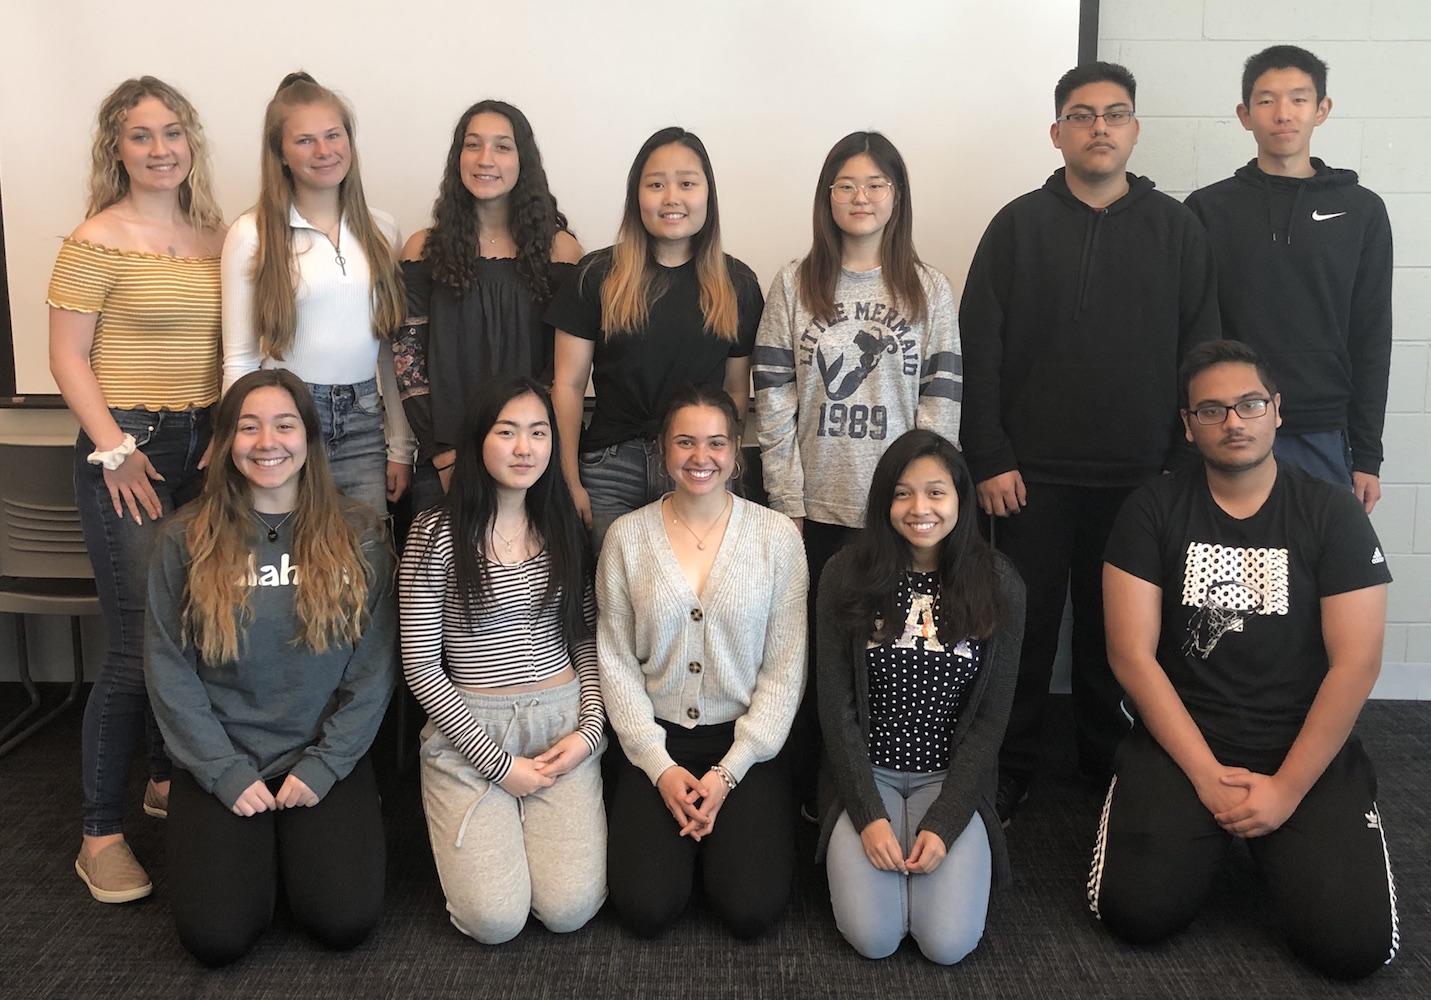 Pictured left to right: Carlie Koziol, Alyssa Nozka, Gianna Penna, Cecilia Kang, Martha Kato, Pablo Bravo, Joseph Chang, Salome Siradze, Catherine Kim, JulieAnne Fossett, Emily Rivera, Krish Patel